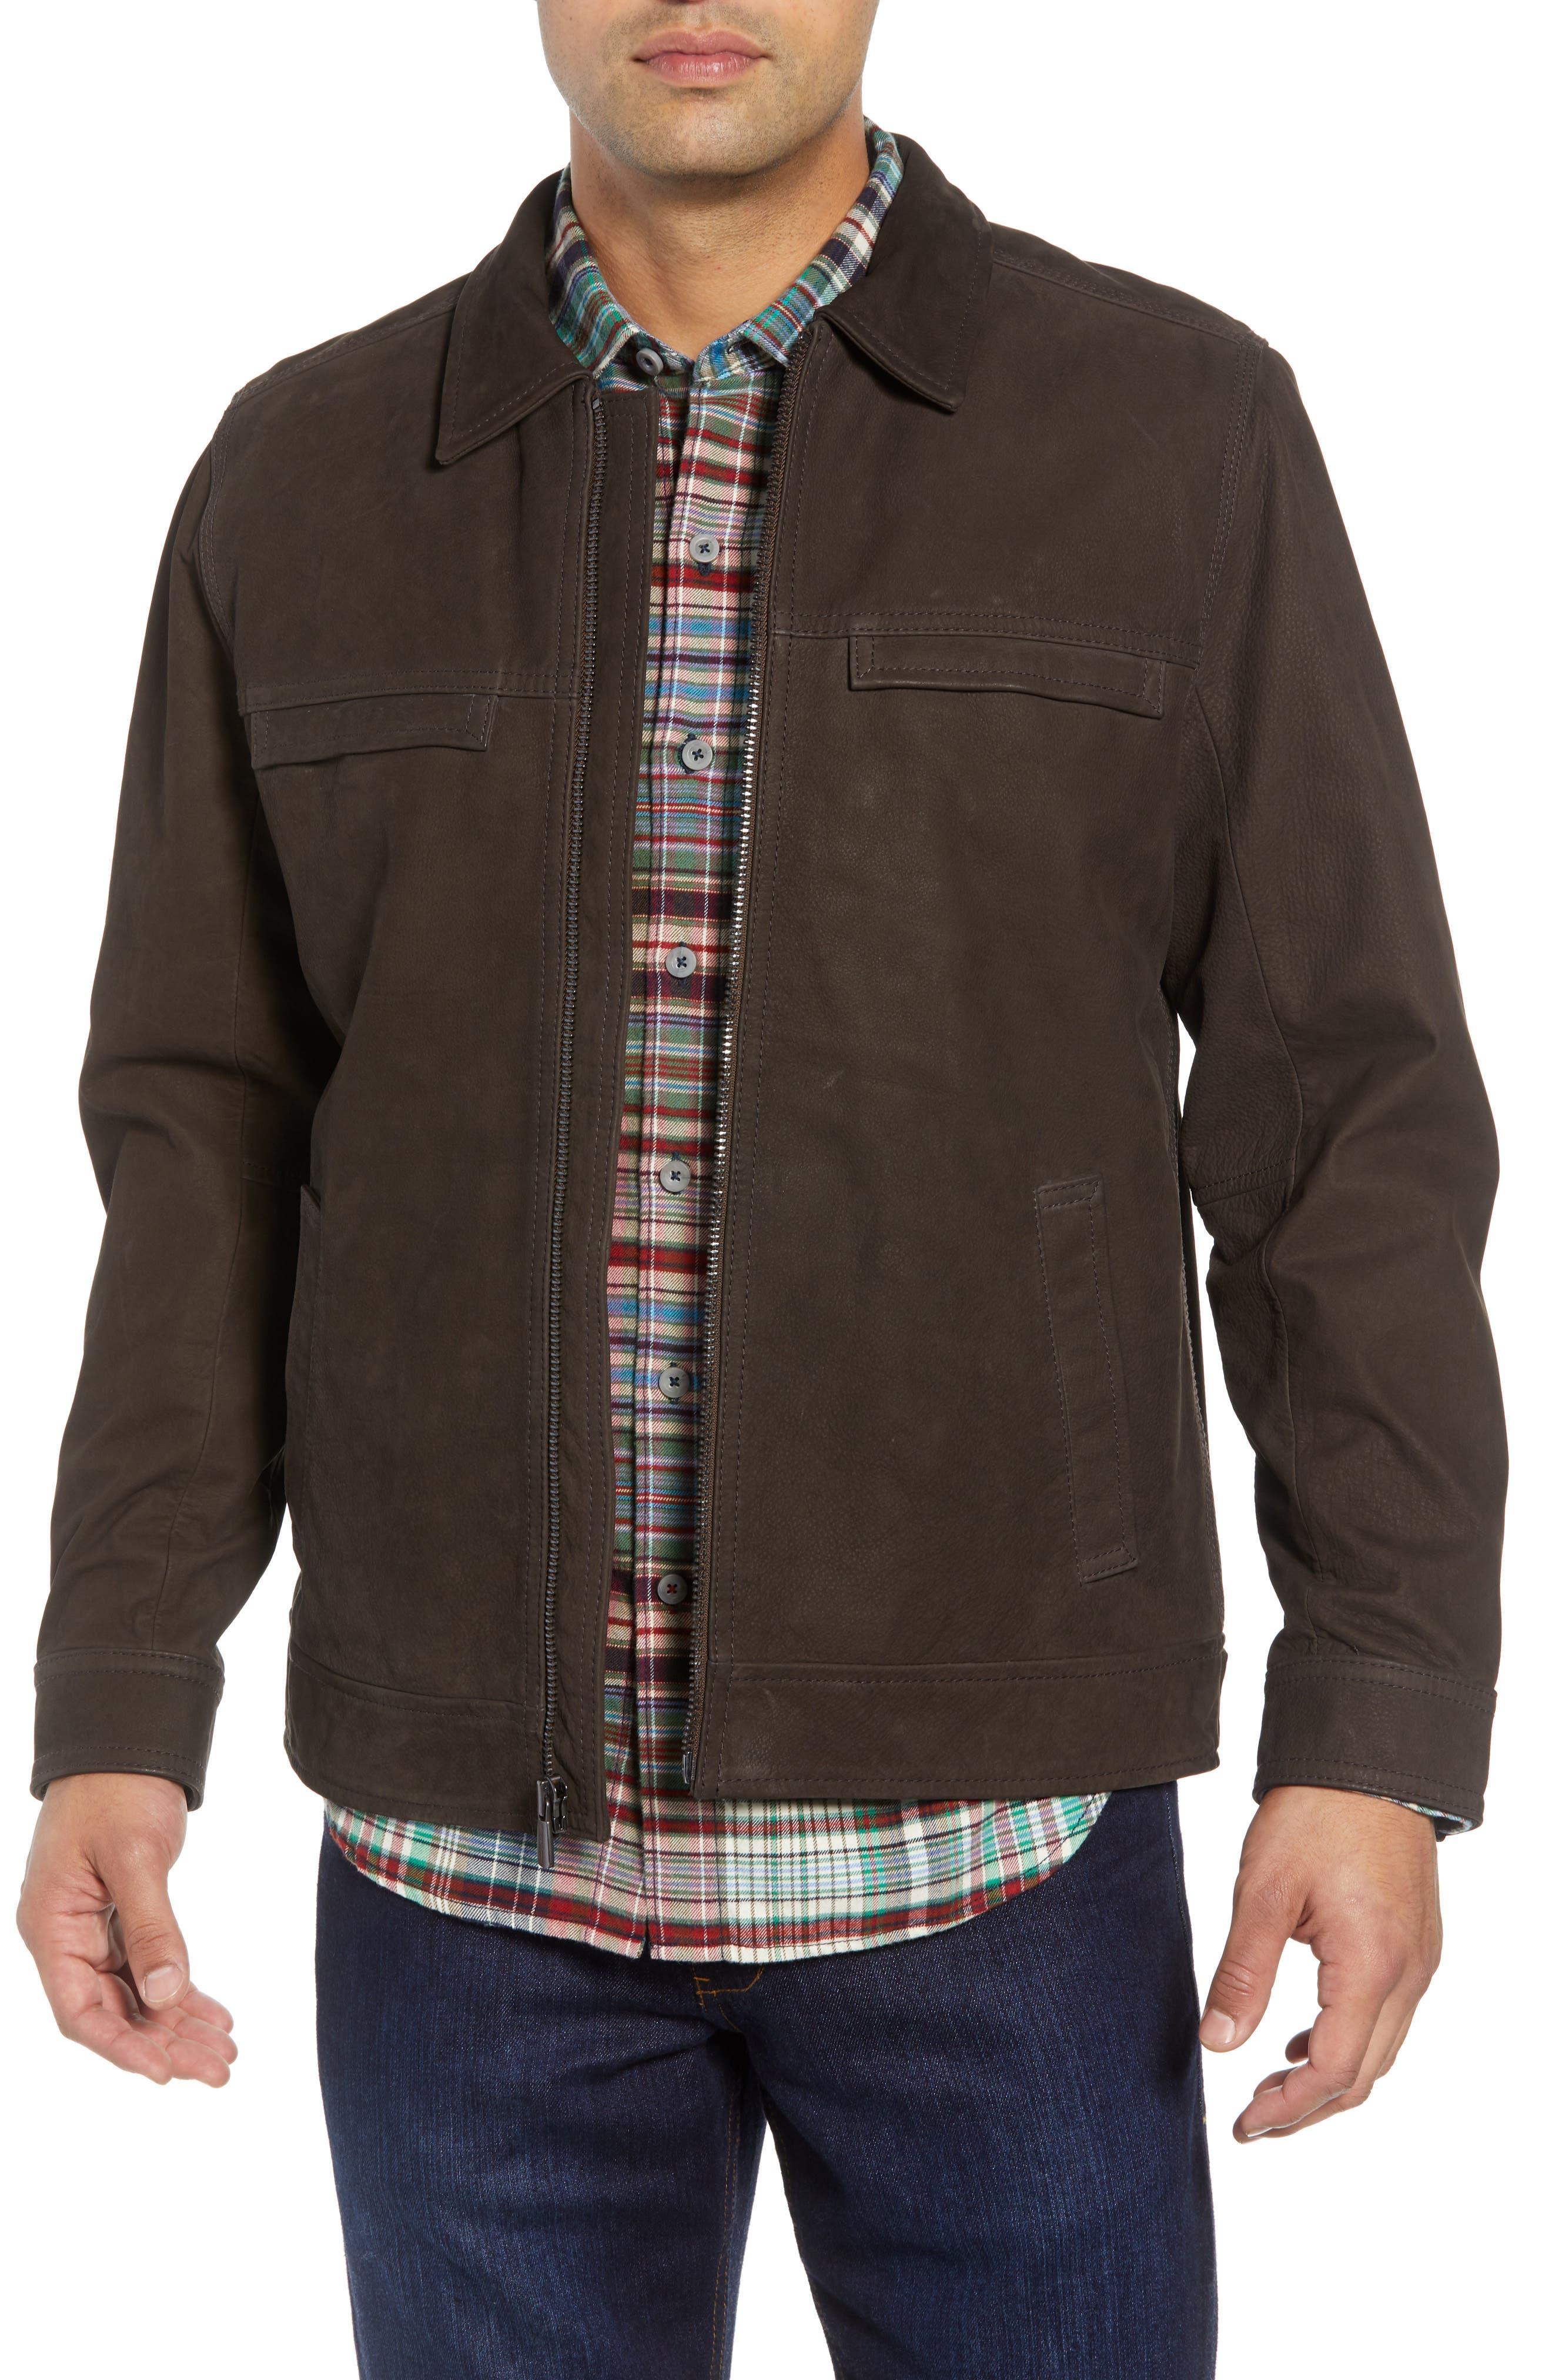 Elliott Bay Leather Jacket,                         Main,                         color, COFFEE